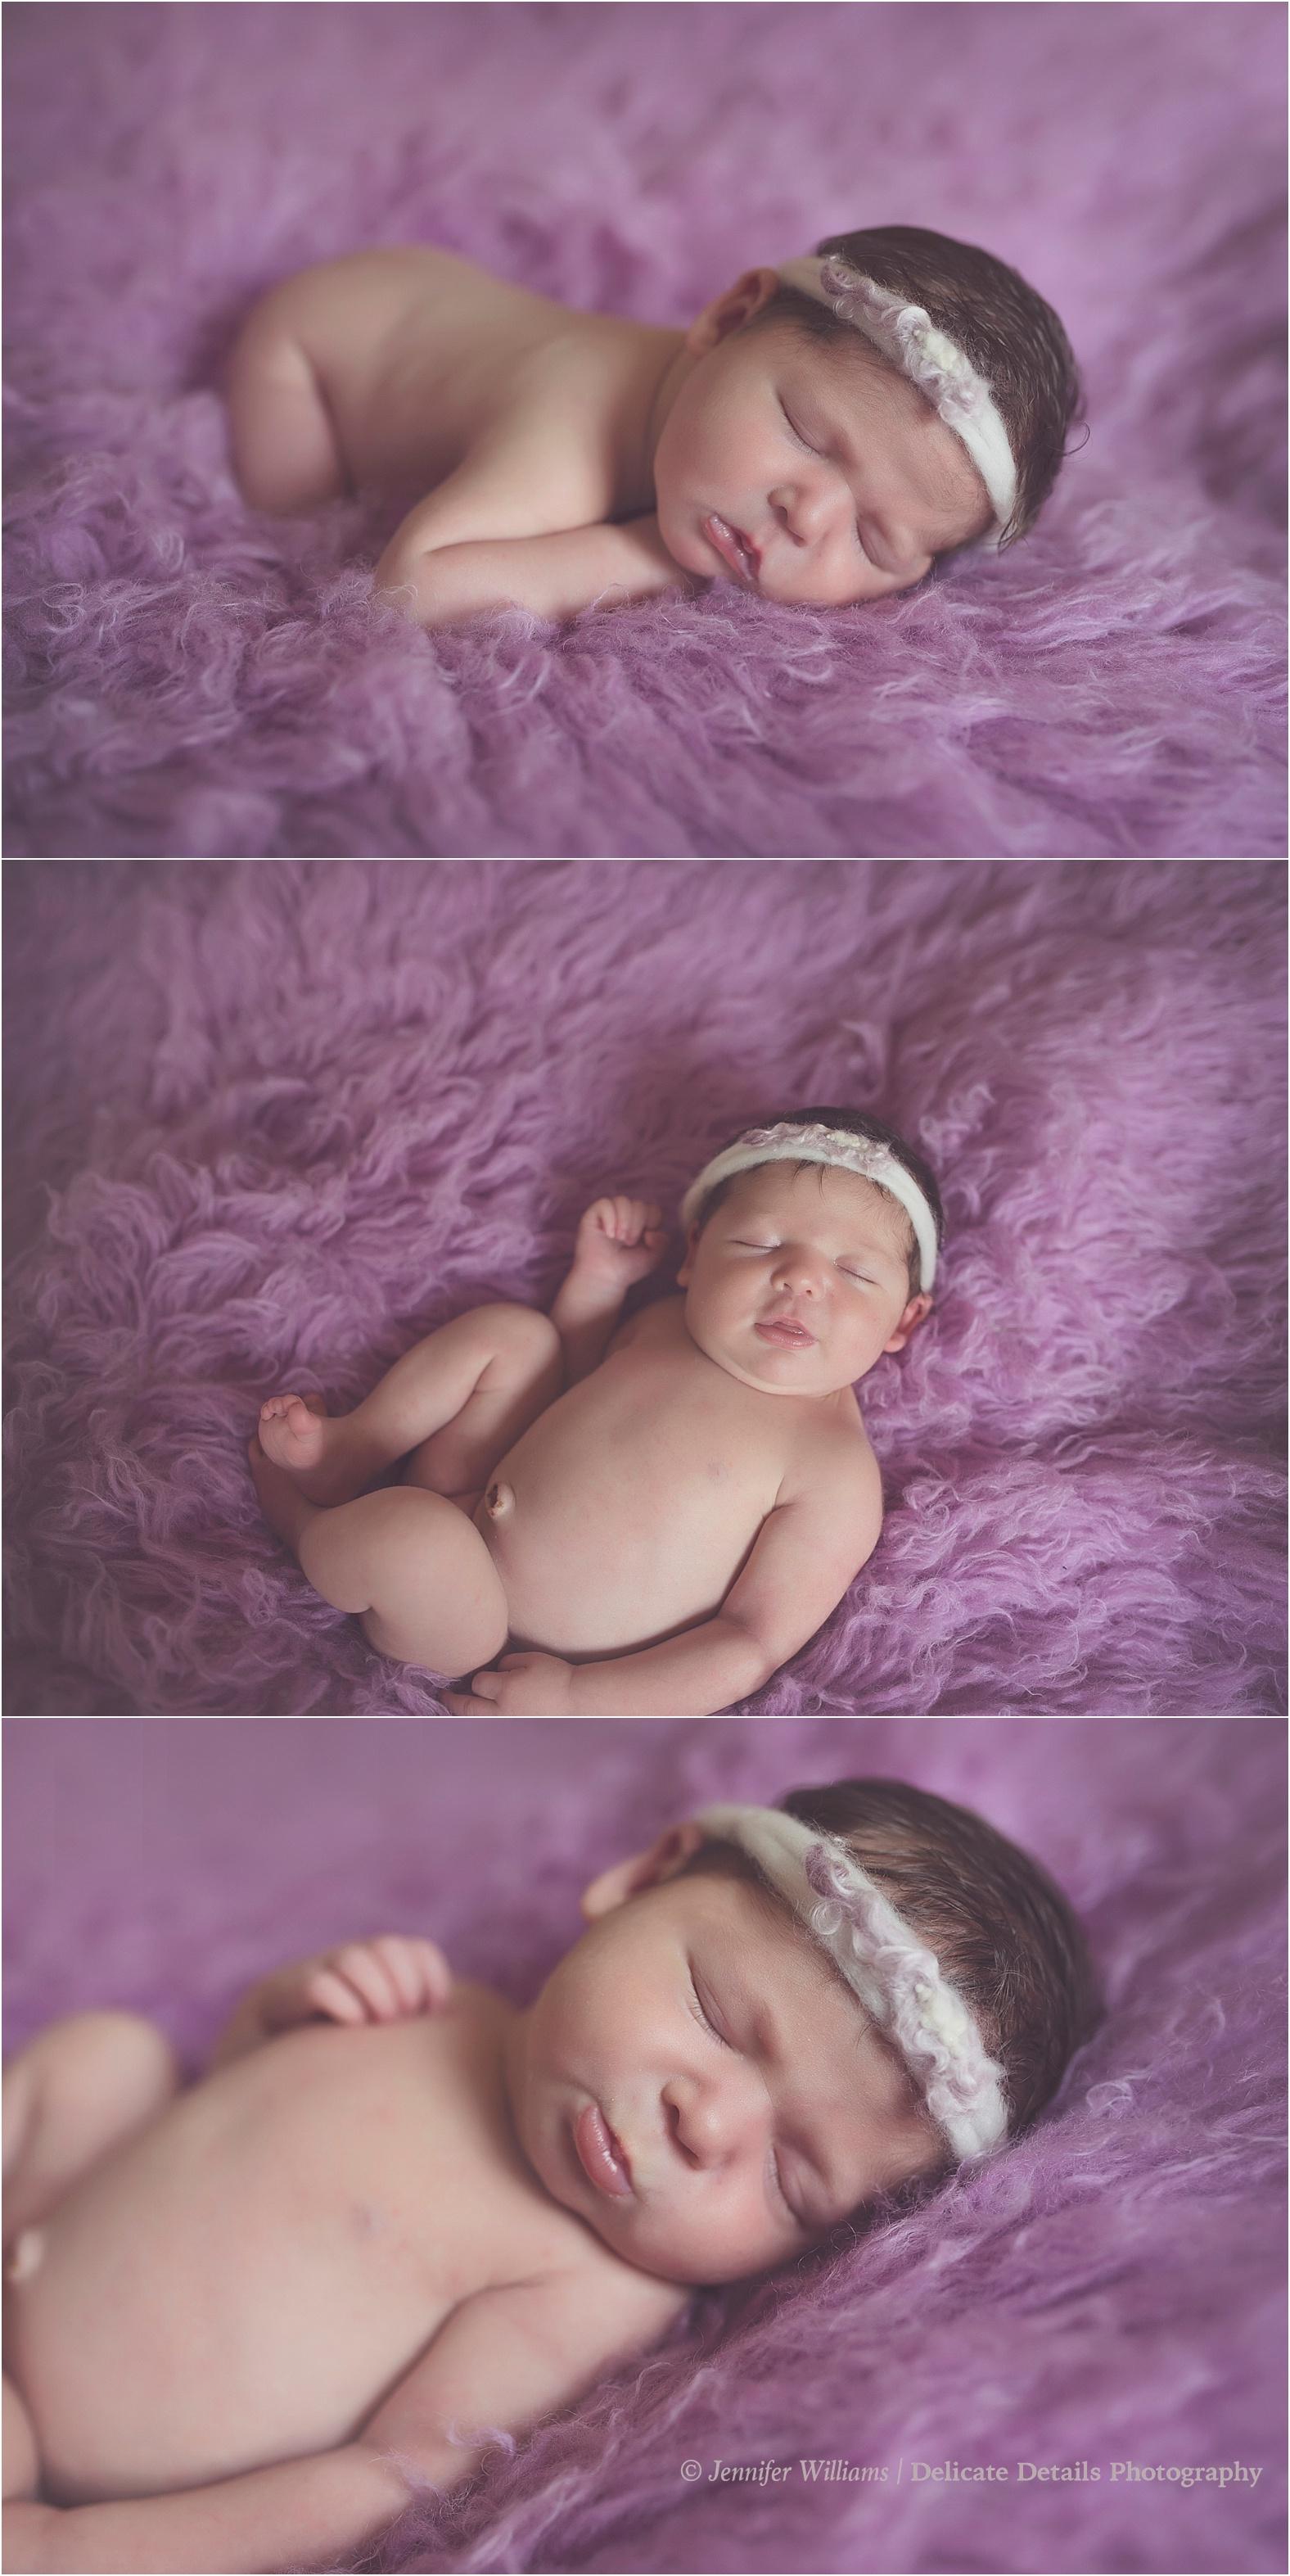 Jennifer Williams | Delicate Details Photography_0363.jpg